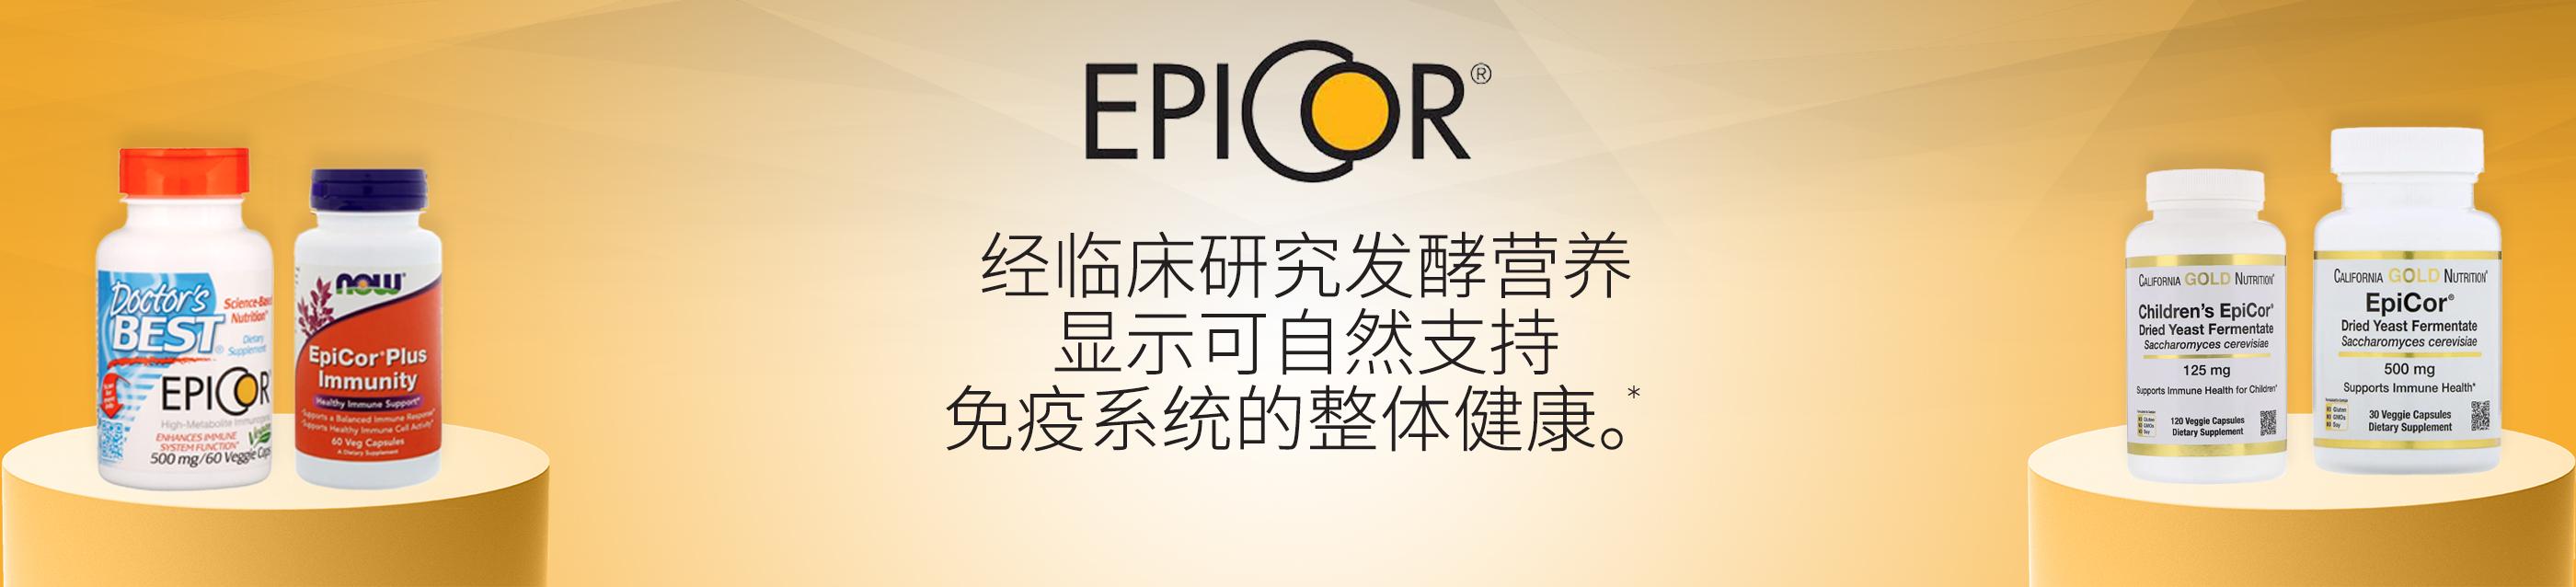 Epicor